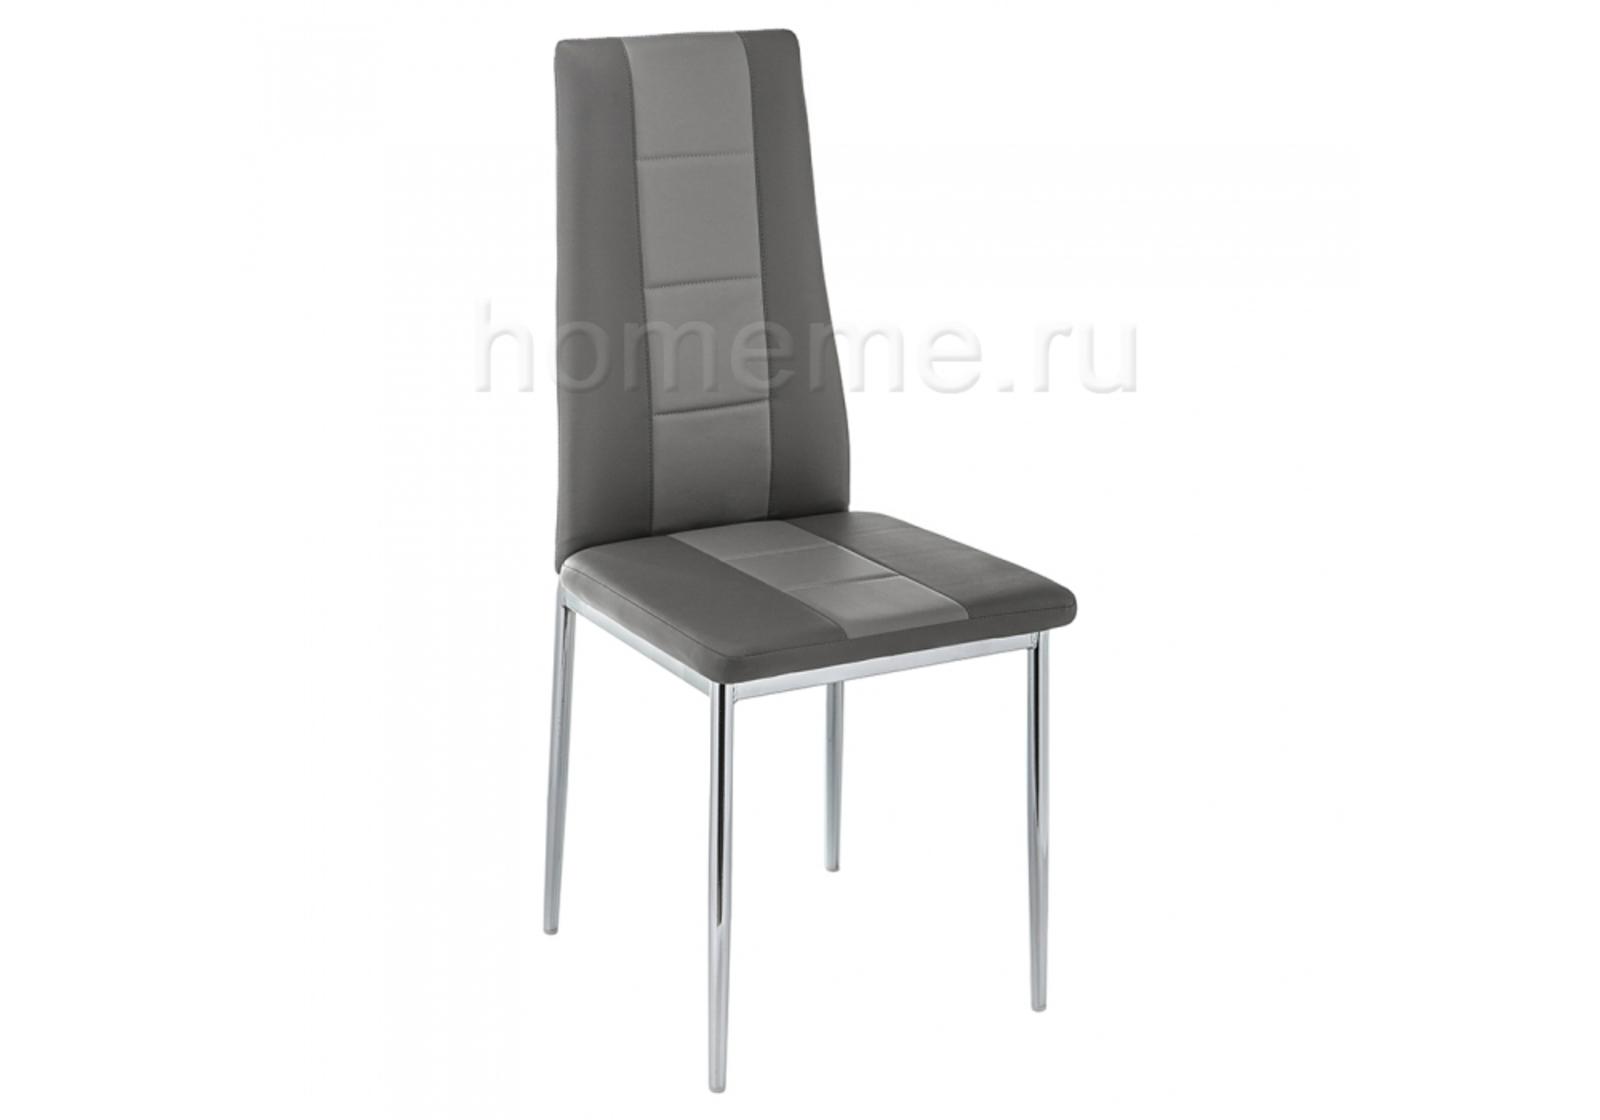 Стул HomeMe Modern темно-серый 11093 от Homeme.ru